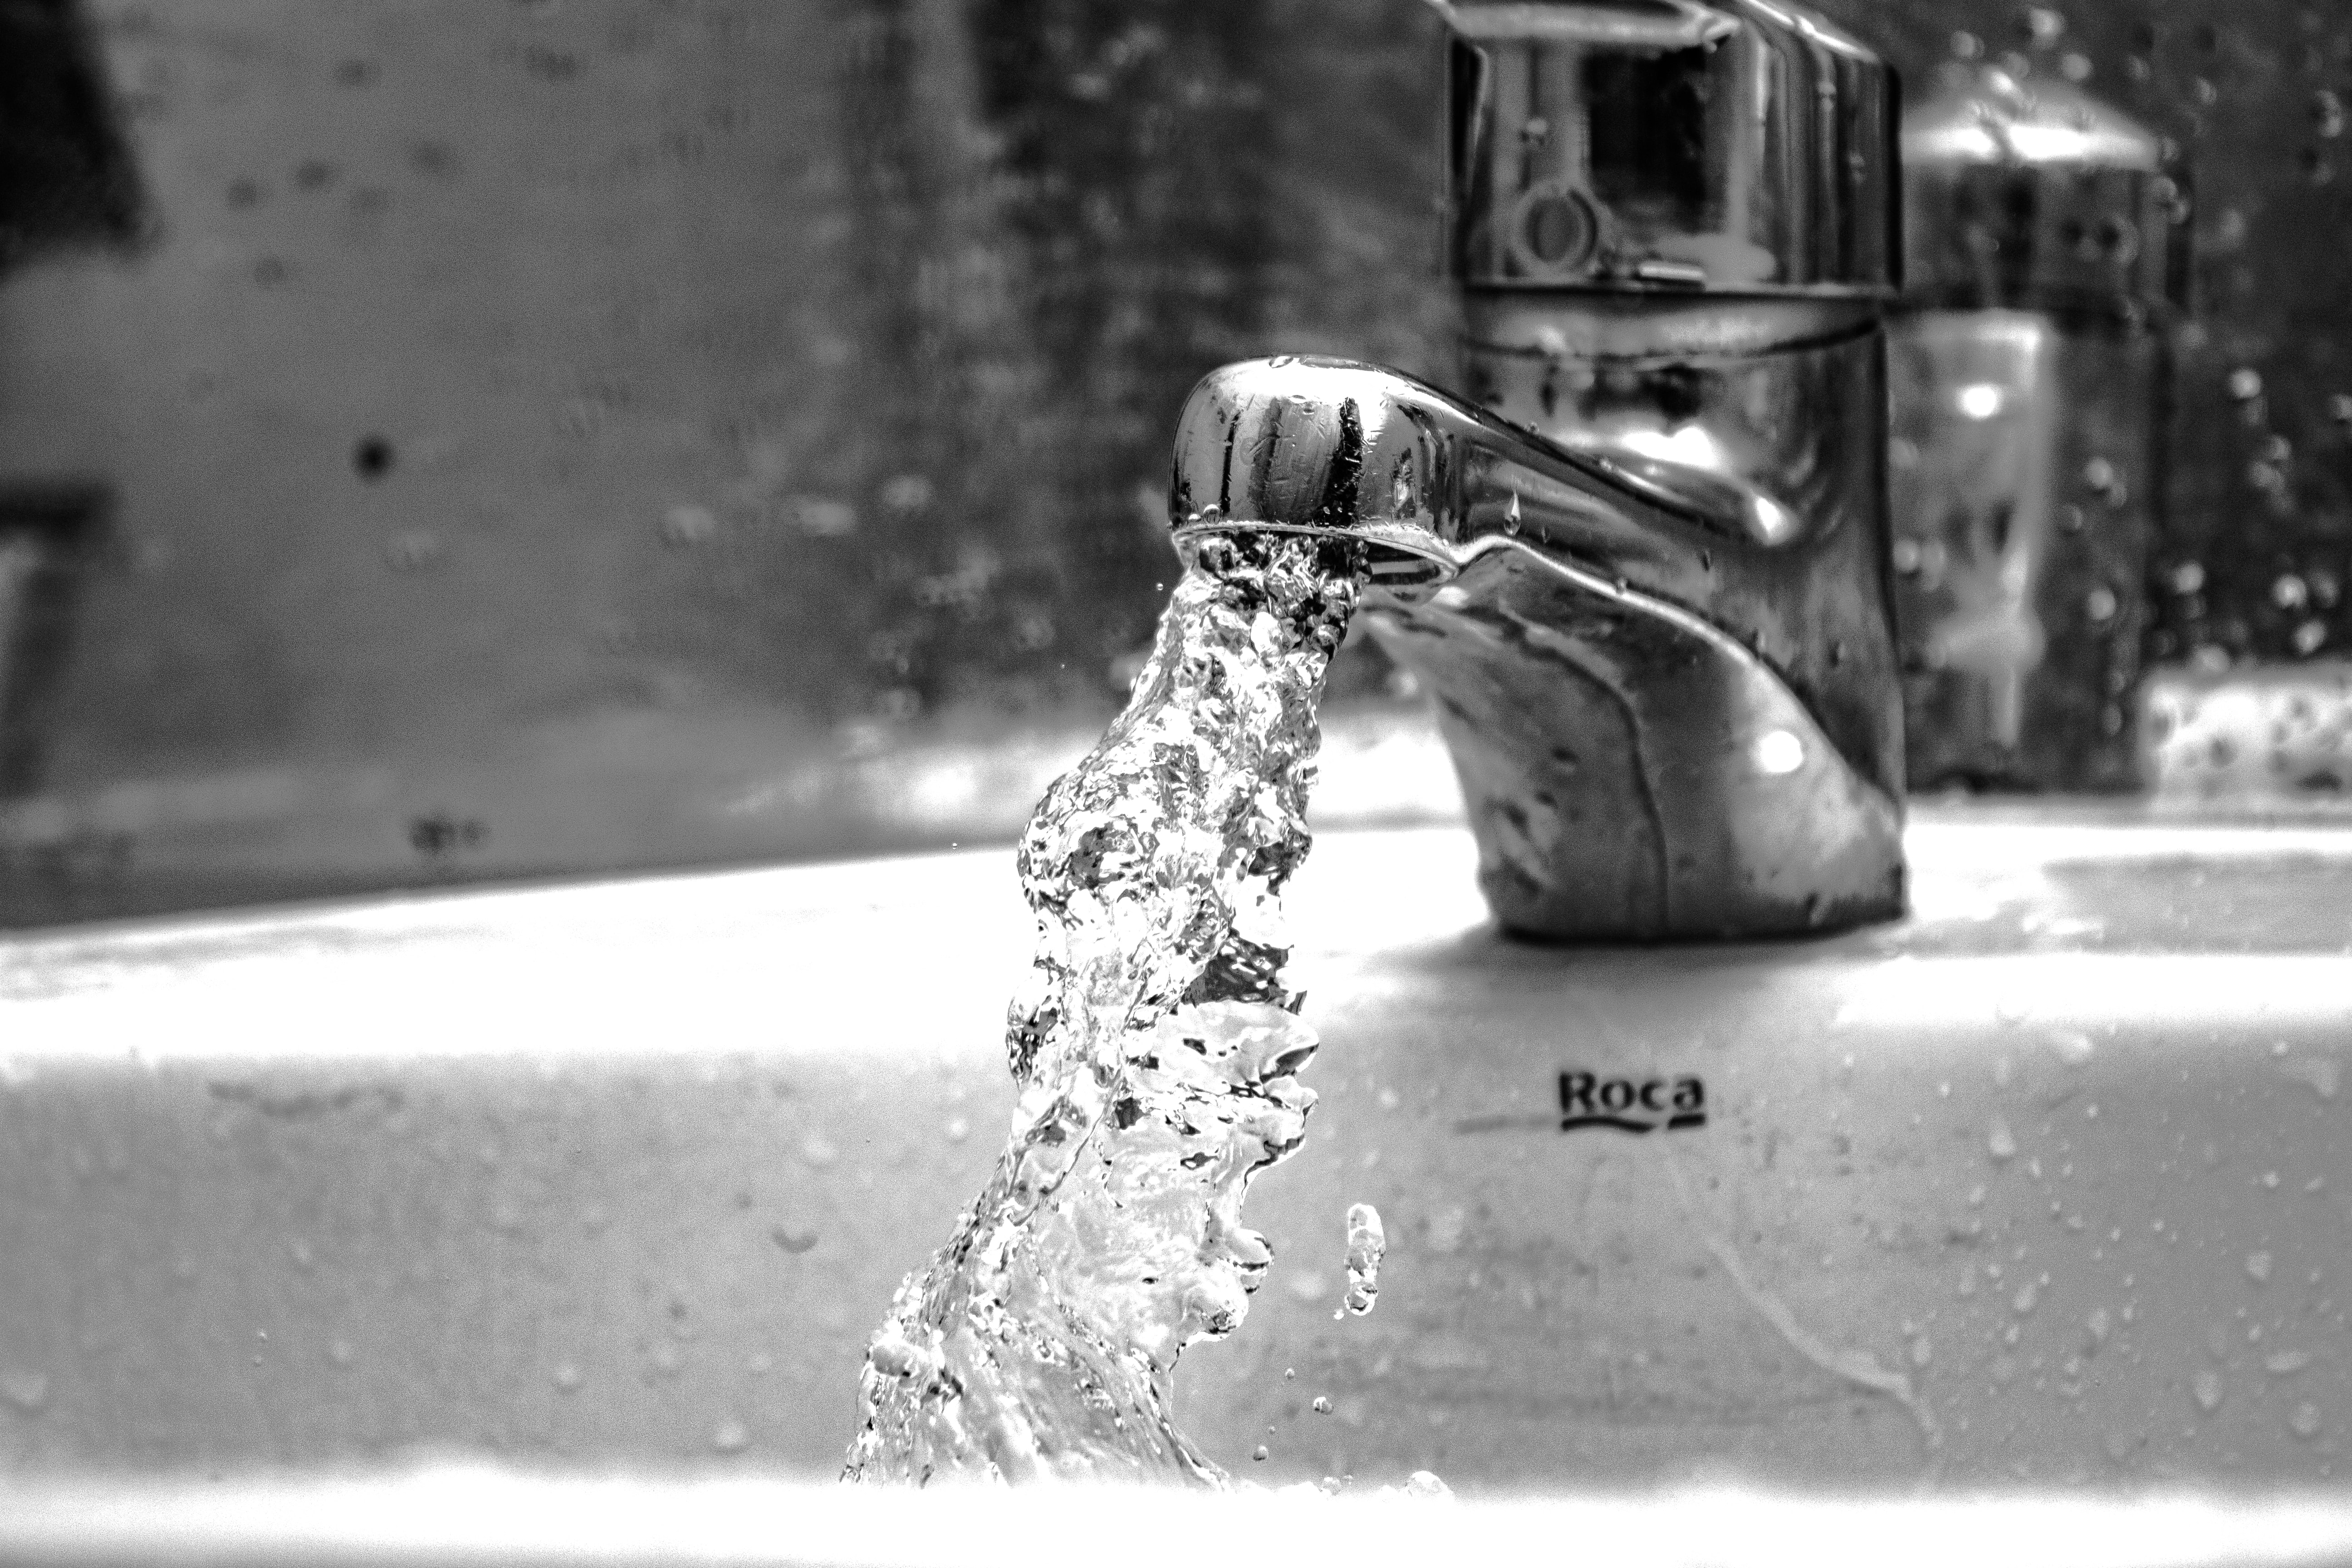 Park Hills Water Deposit Rates Increase